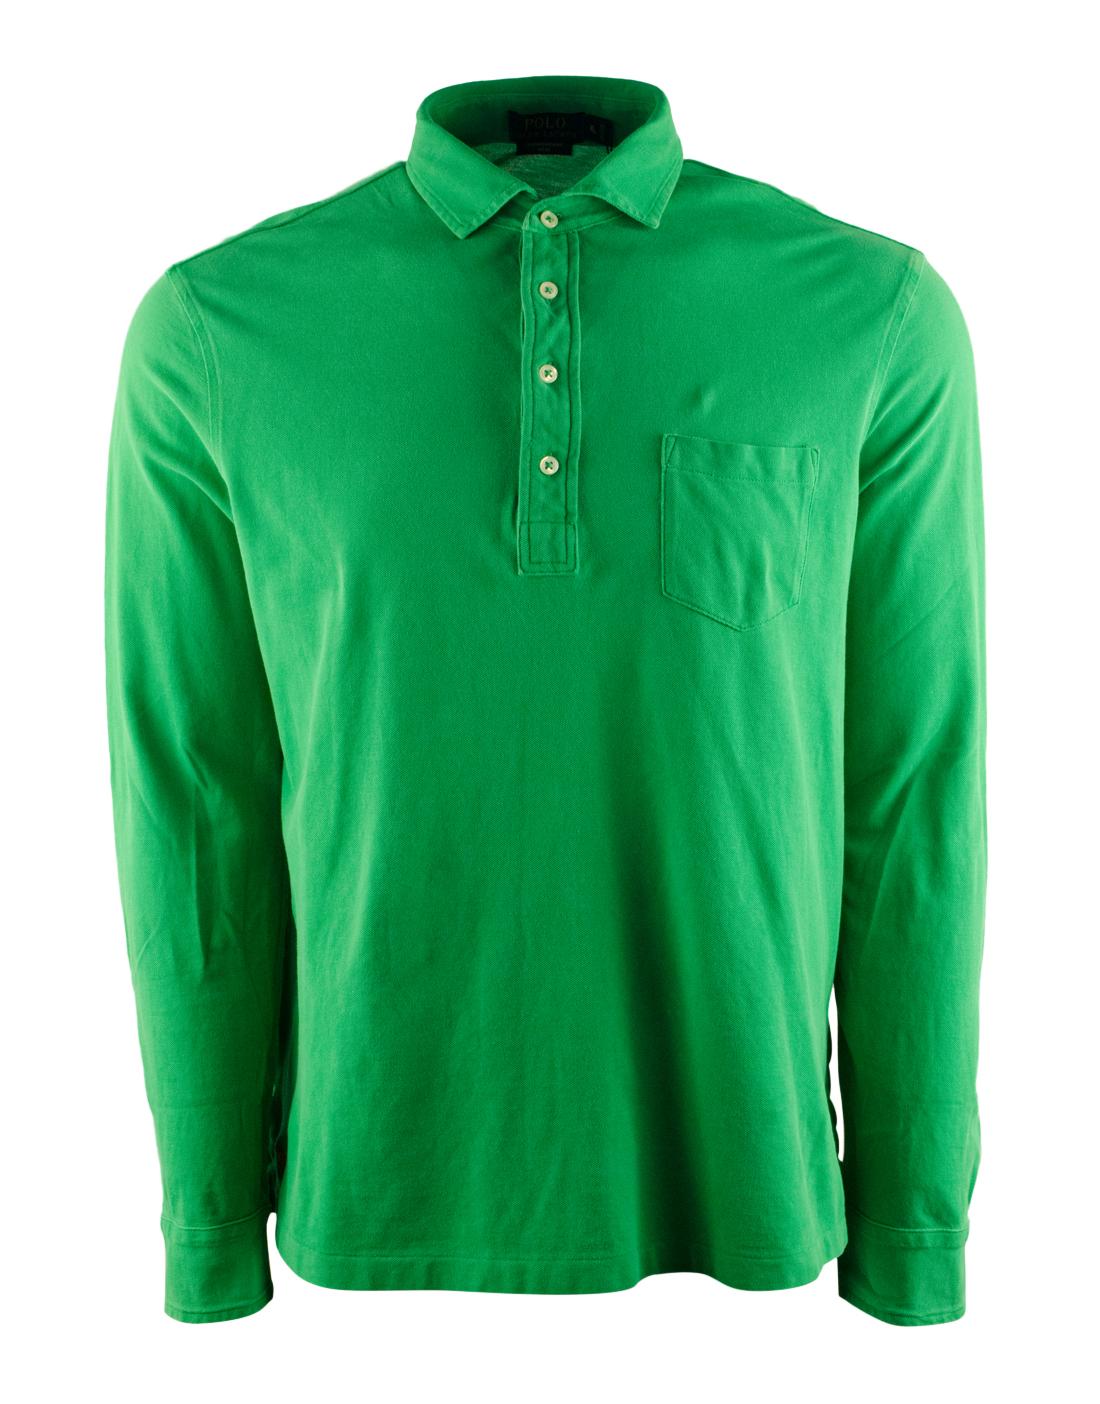 Polo ralph lauren men 39 s featherweight mesh long sleeve for Long sleeve pocket shirts